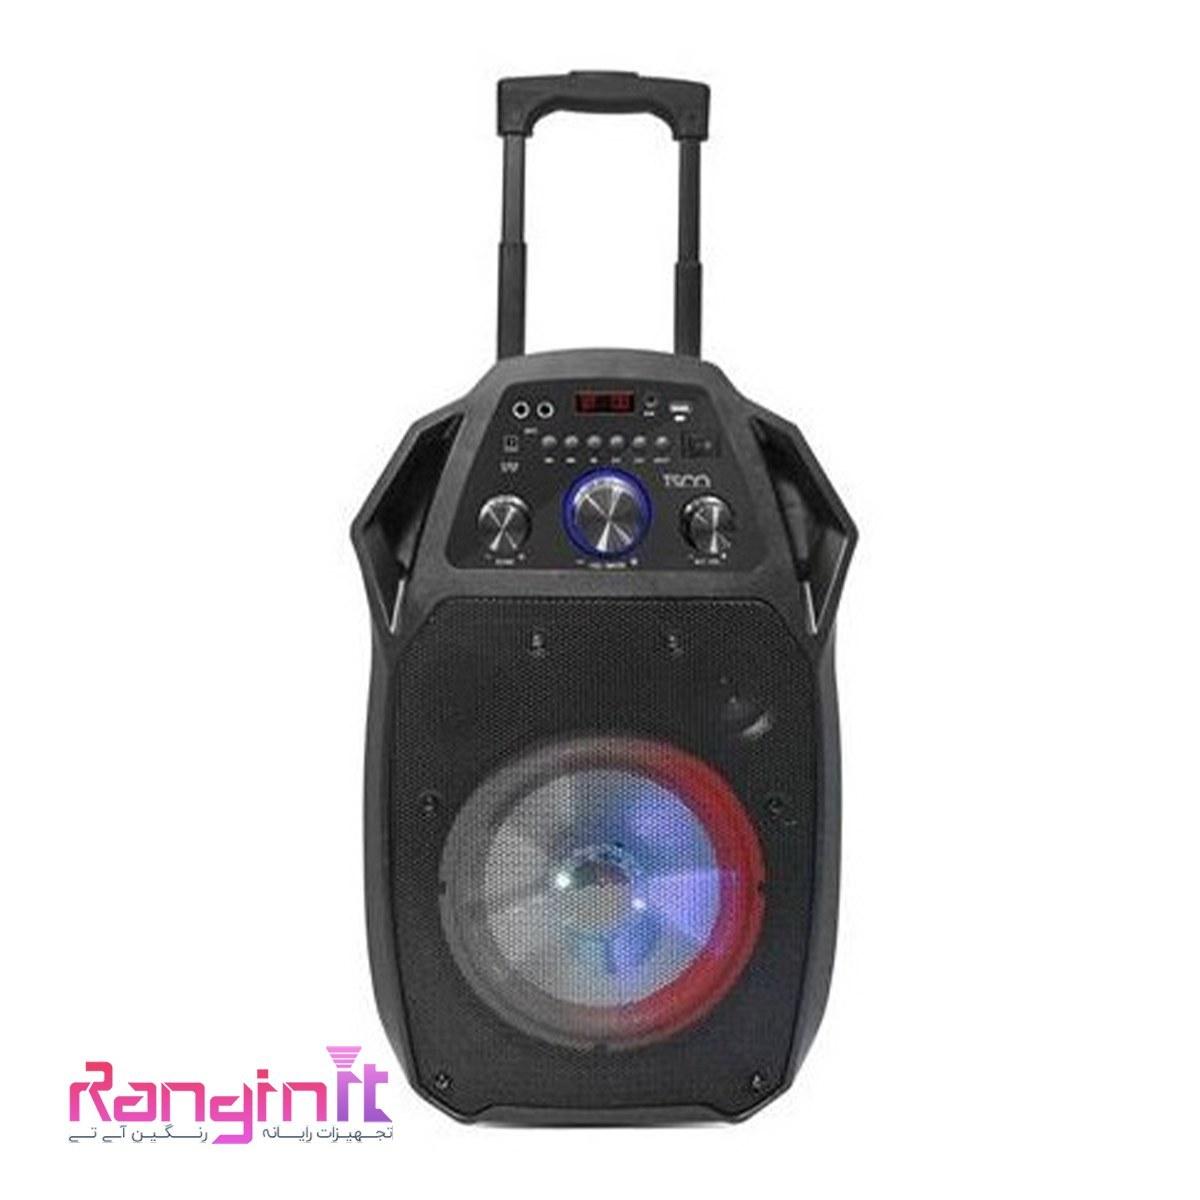 main images اسپیکر بلوتوث تسکو مدل TS 1850 TSCO TS 1850 Portable Bluetooth Speaker